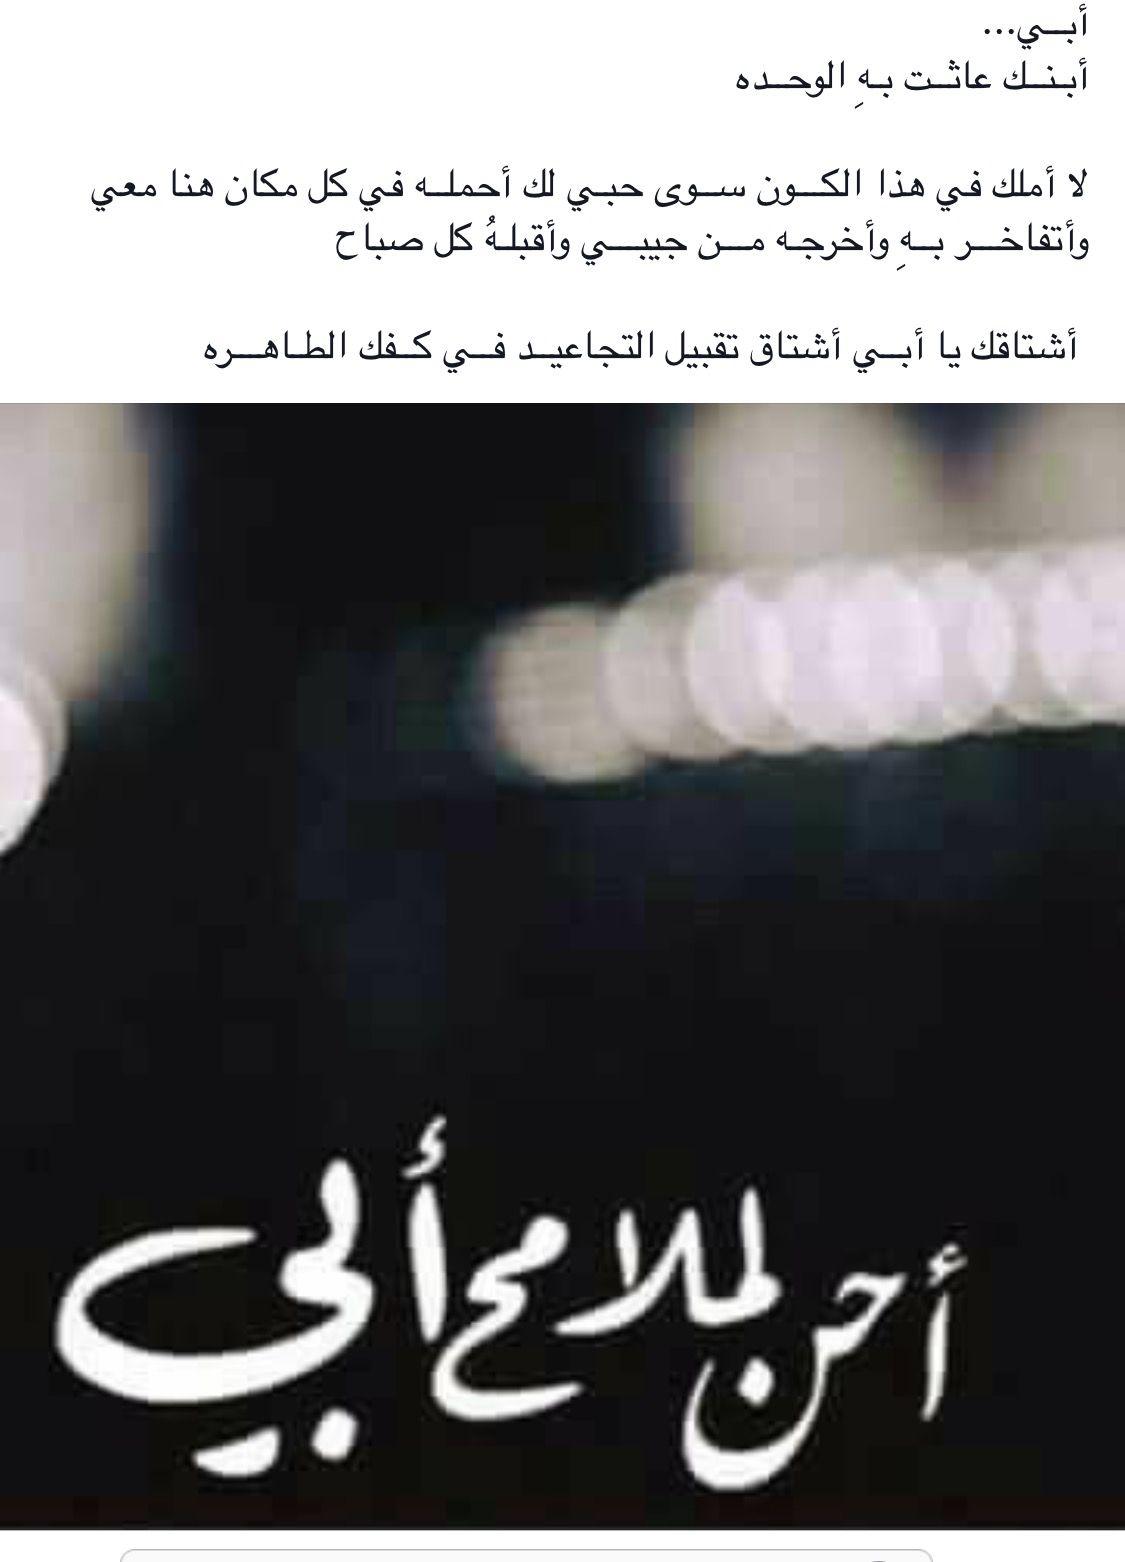 Pin by مـــرتضى زامــل on ولِـي فيّ القلب ذكـرى | Arabic